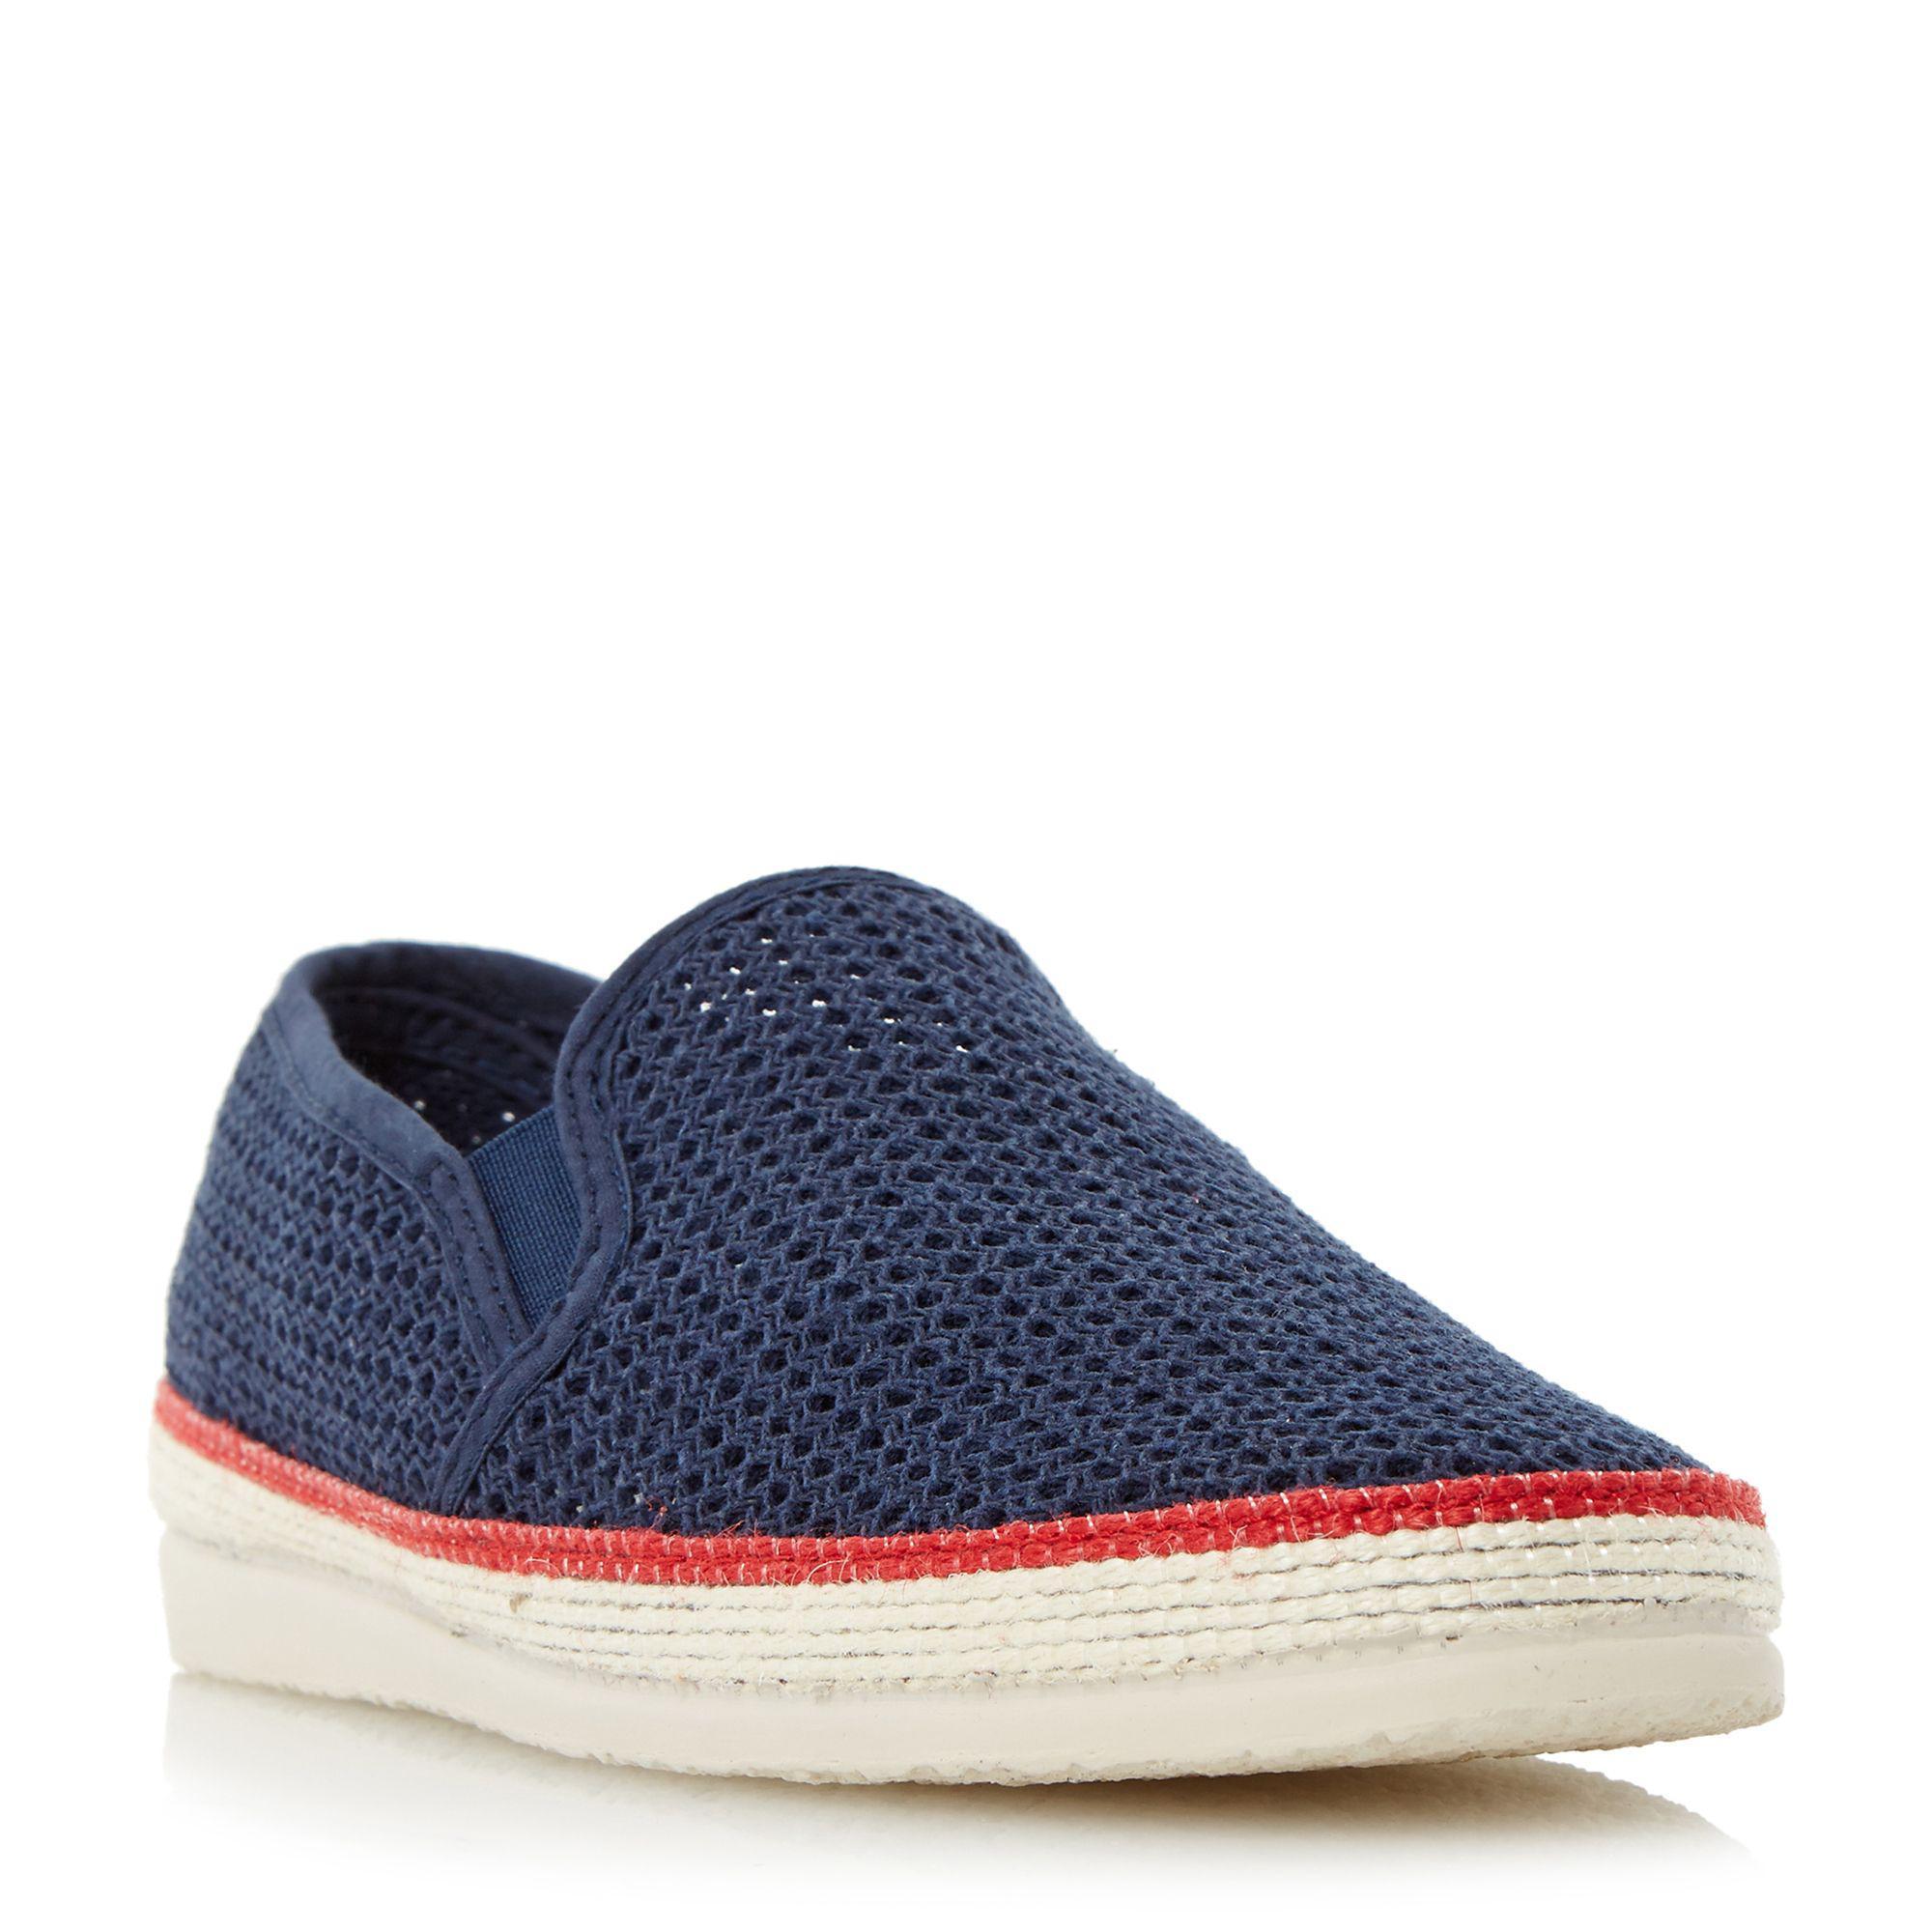 fae7e4352 Bertie Navy 'fresh' Mesh Detail Espadrille Shoe in Blue for Men - Lyst